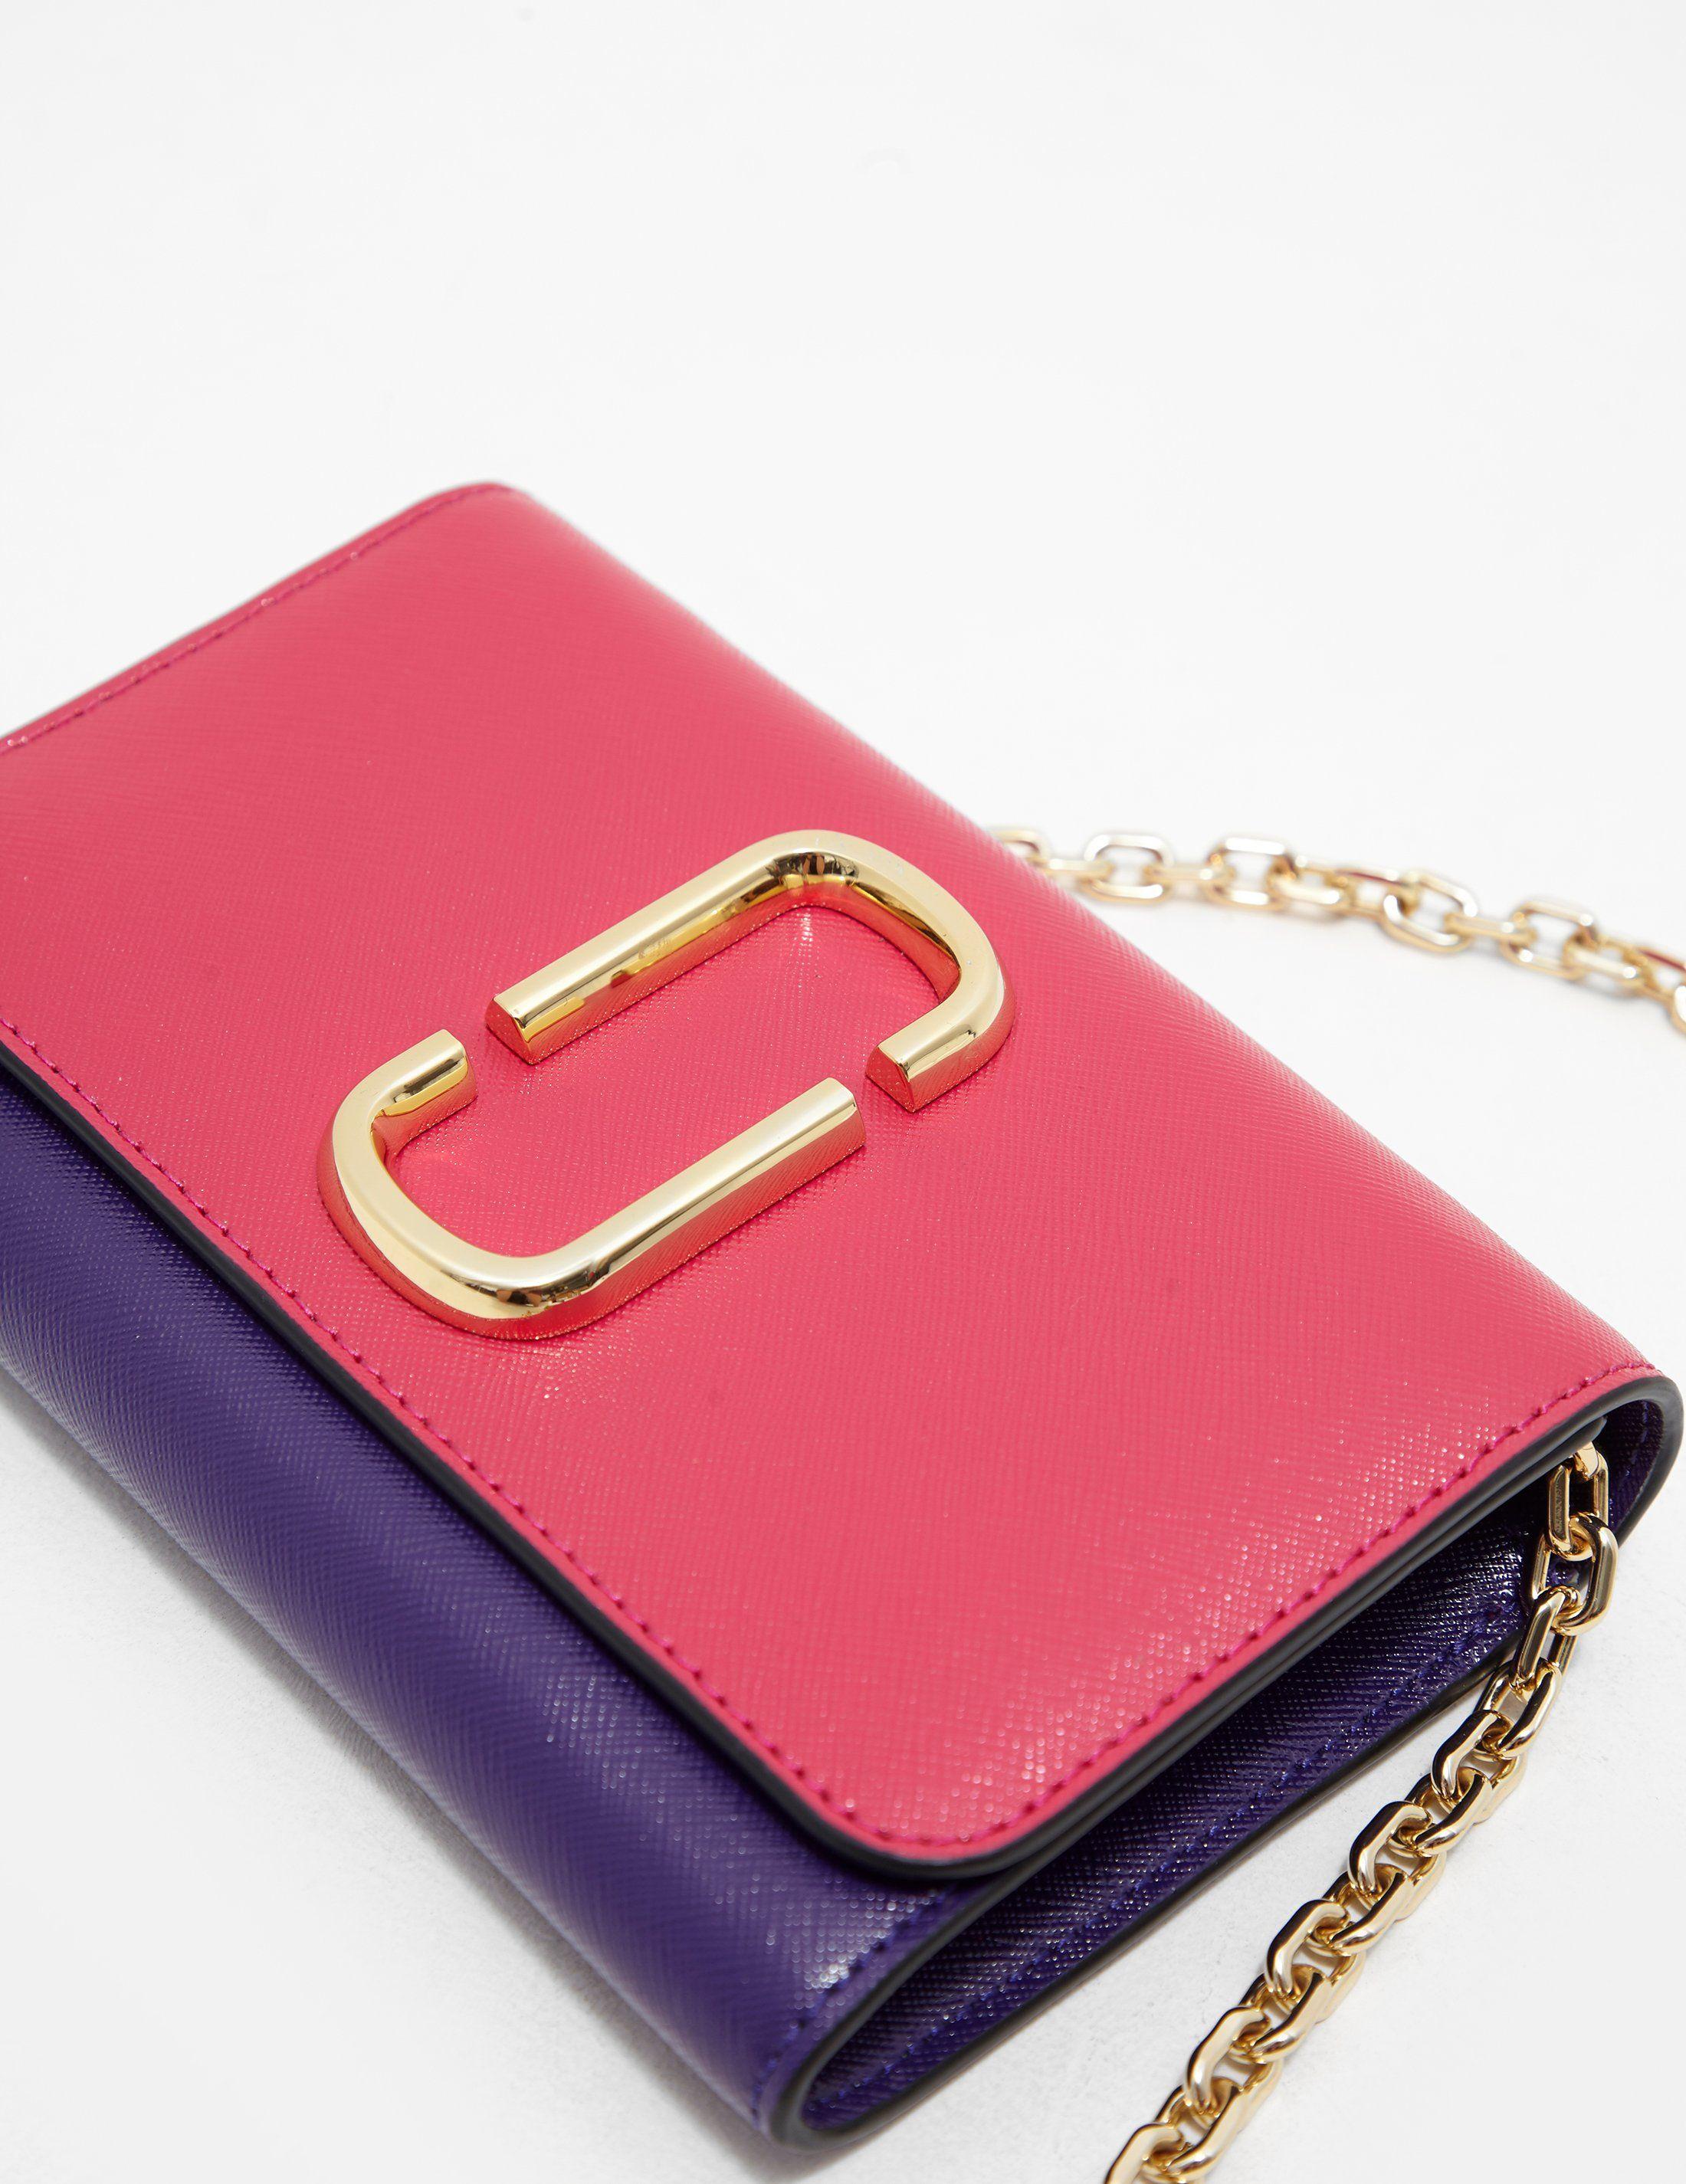 Marc Jacobs Chain Shoulder Bag